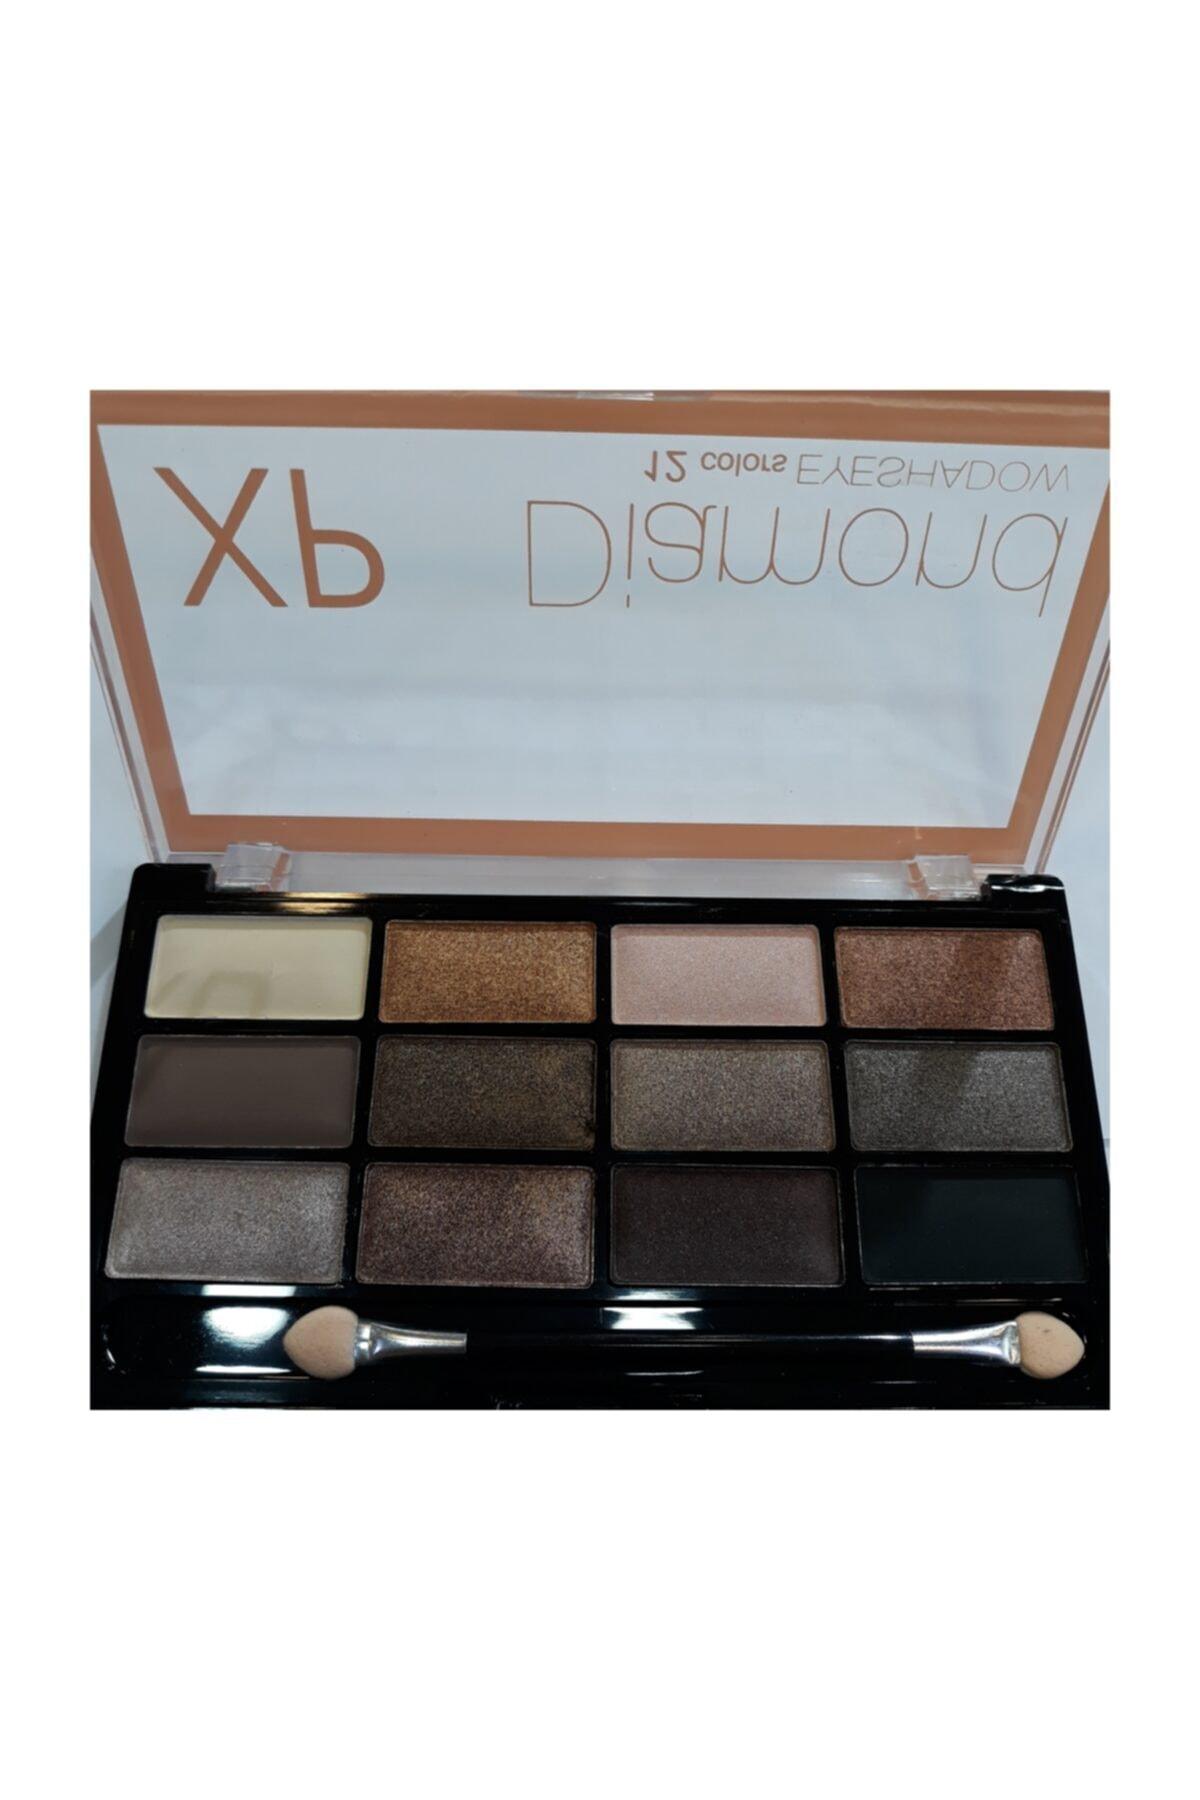 XP Dıamond 12 Colors Eyeshadow 1